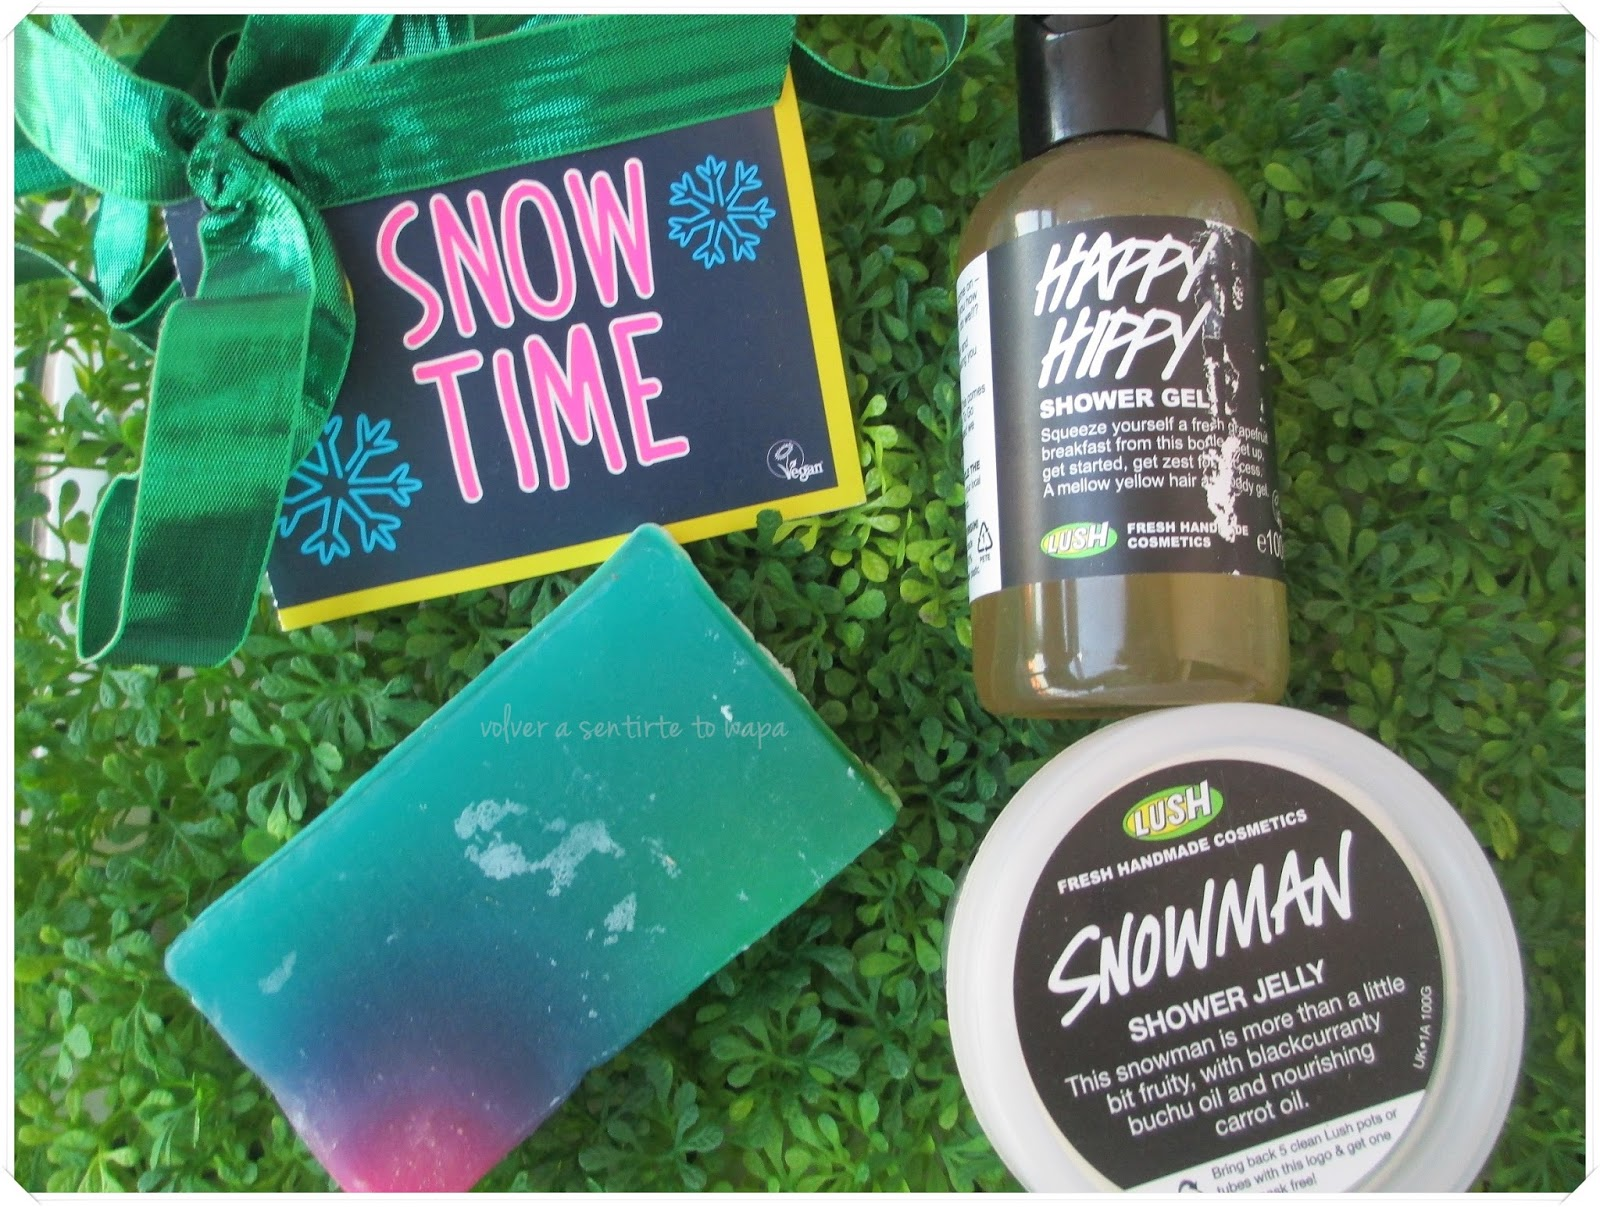 Lush Snow Time: Gel Happy Hippy, Gelatina Snowman y Jabón Baked Alaska